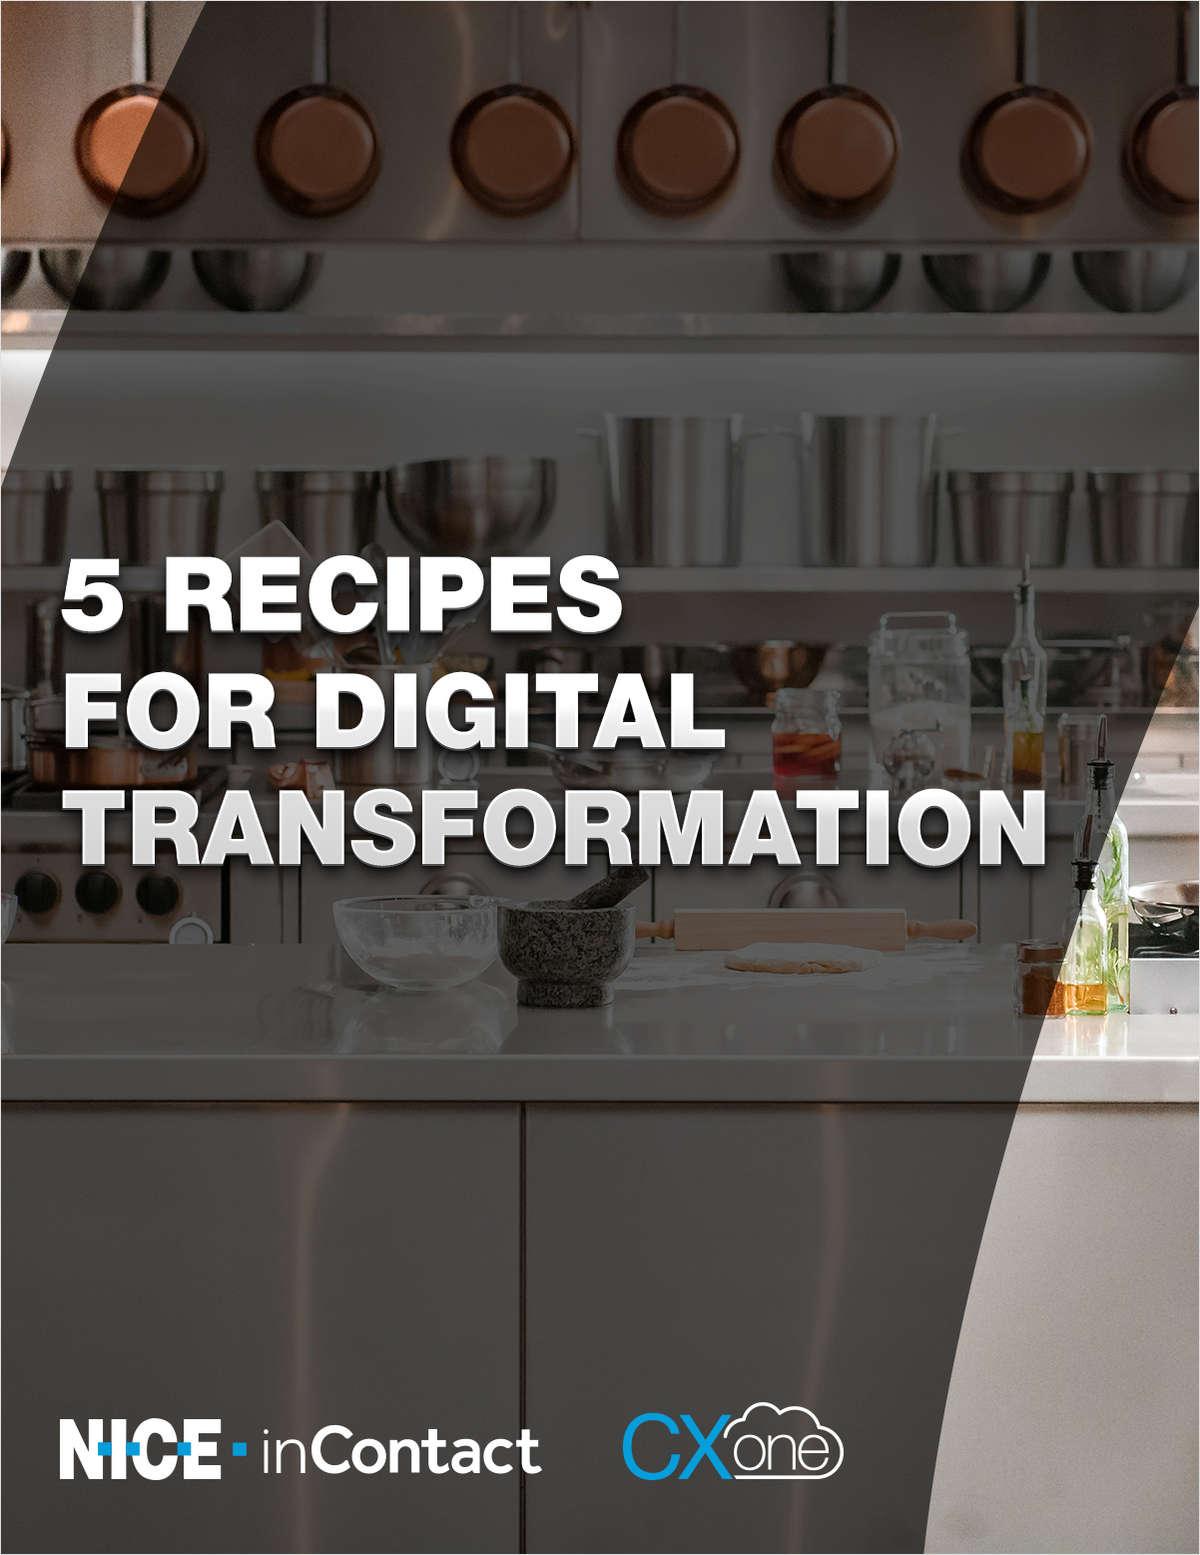 5 Recipes for Digital Transformation